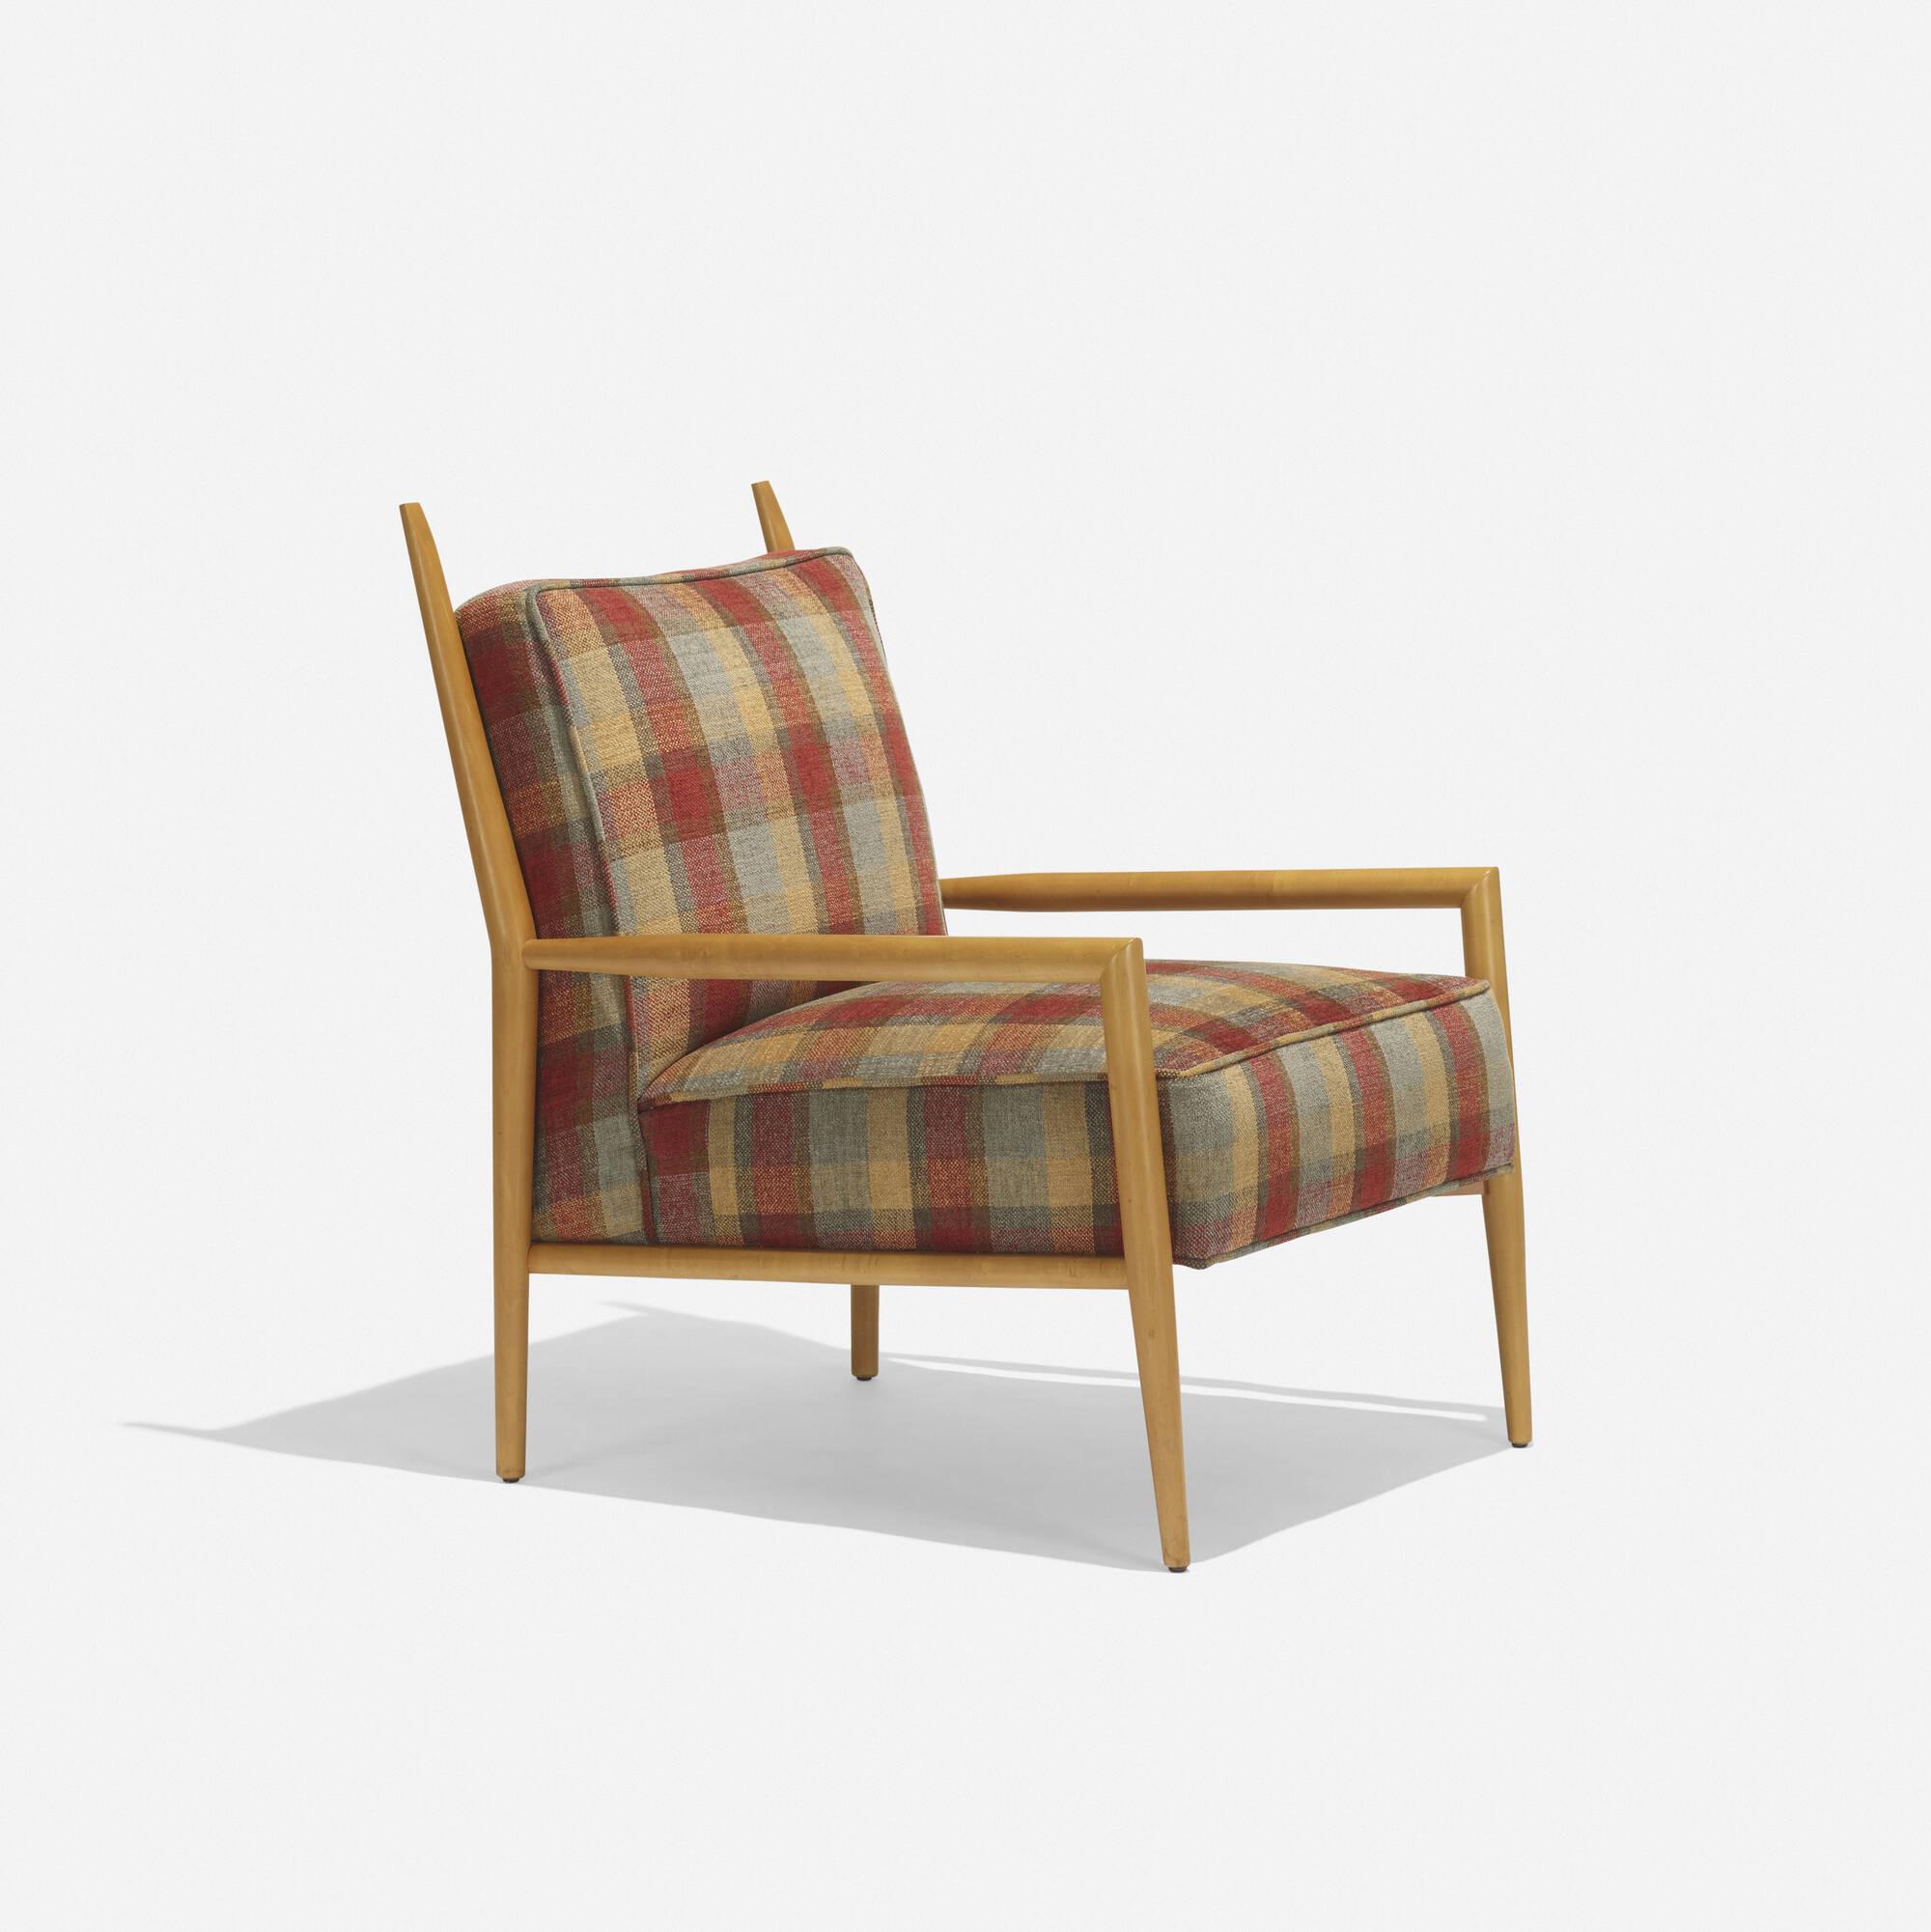 241 Paul Mccobb Planner Group Lounge Chair Model 3082